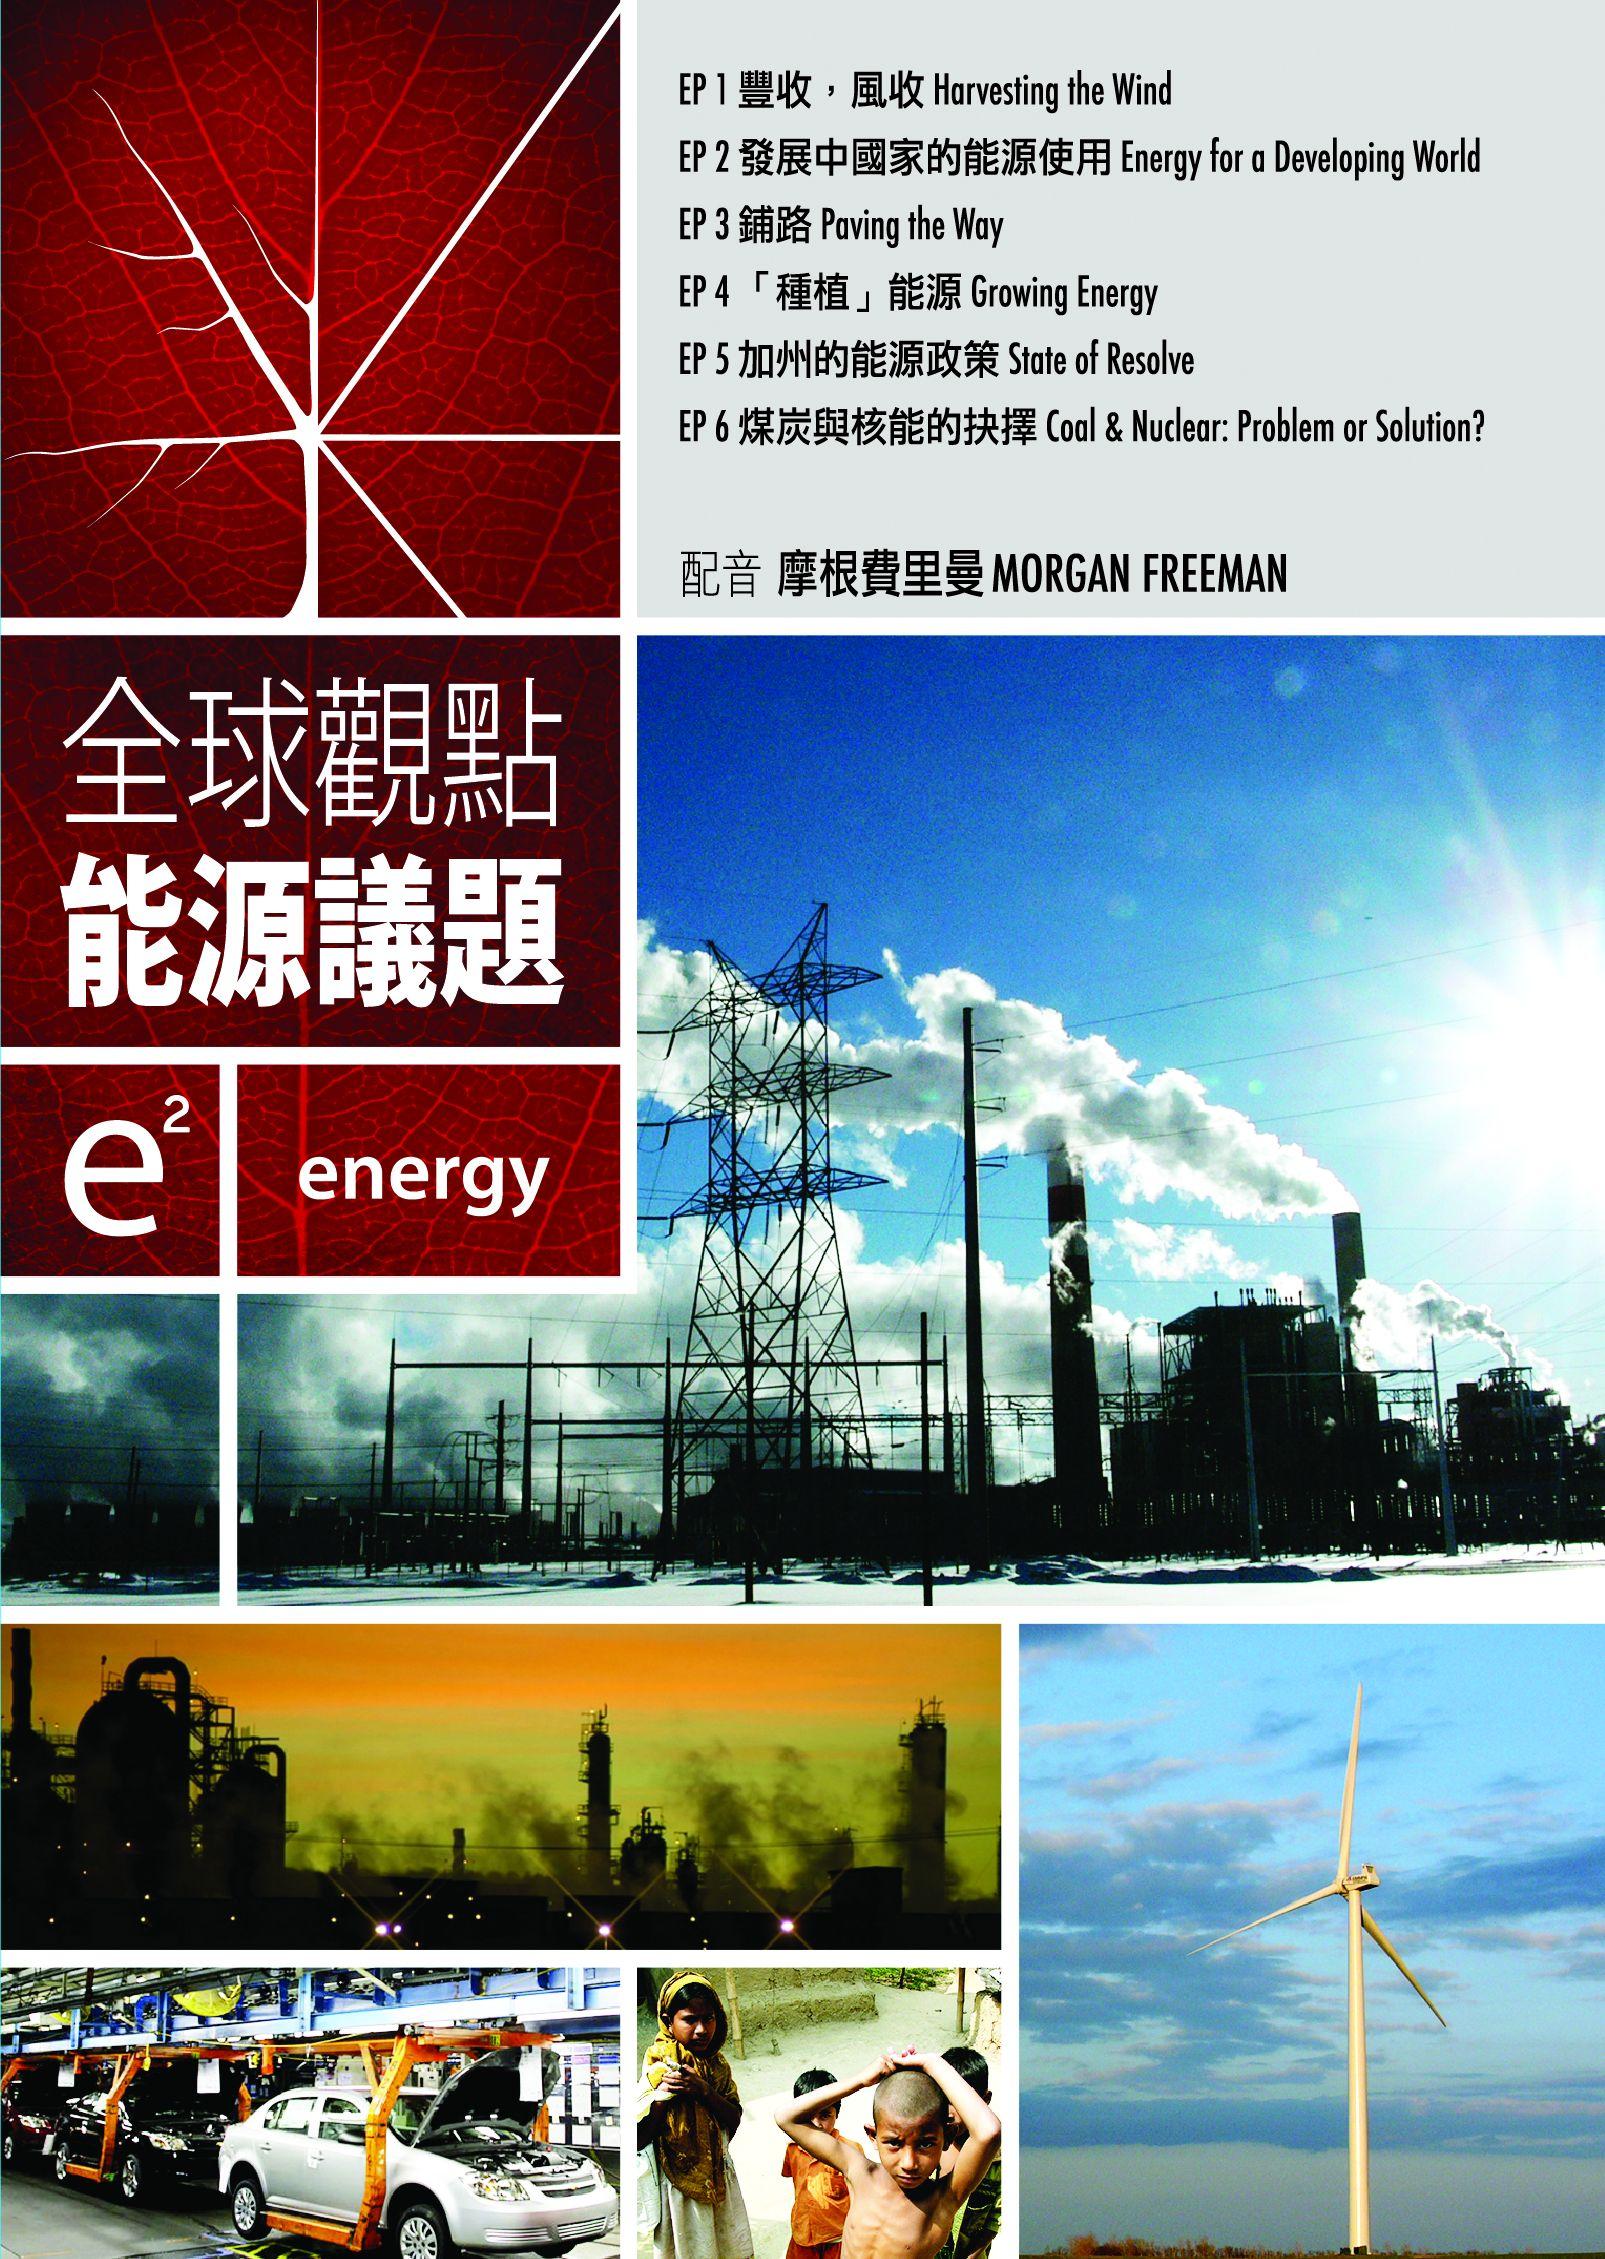 全球觀點:能源議題